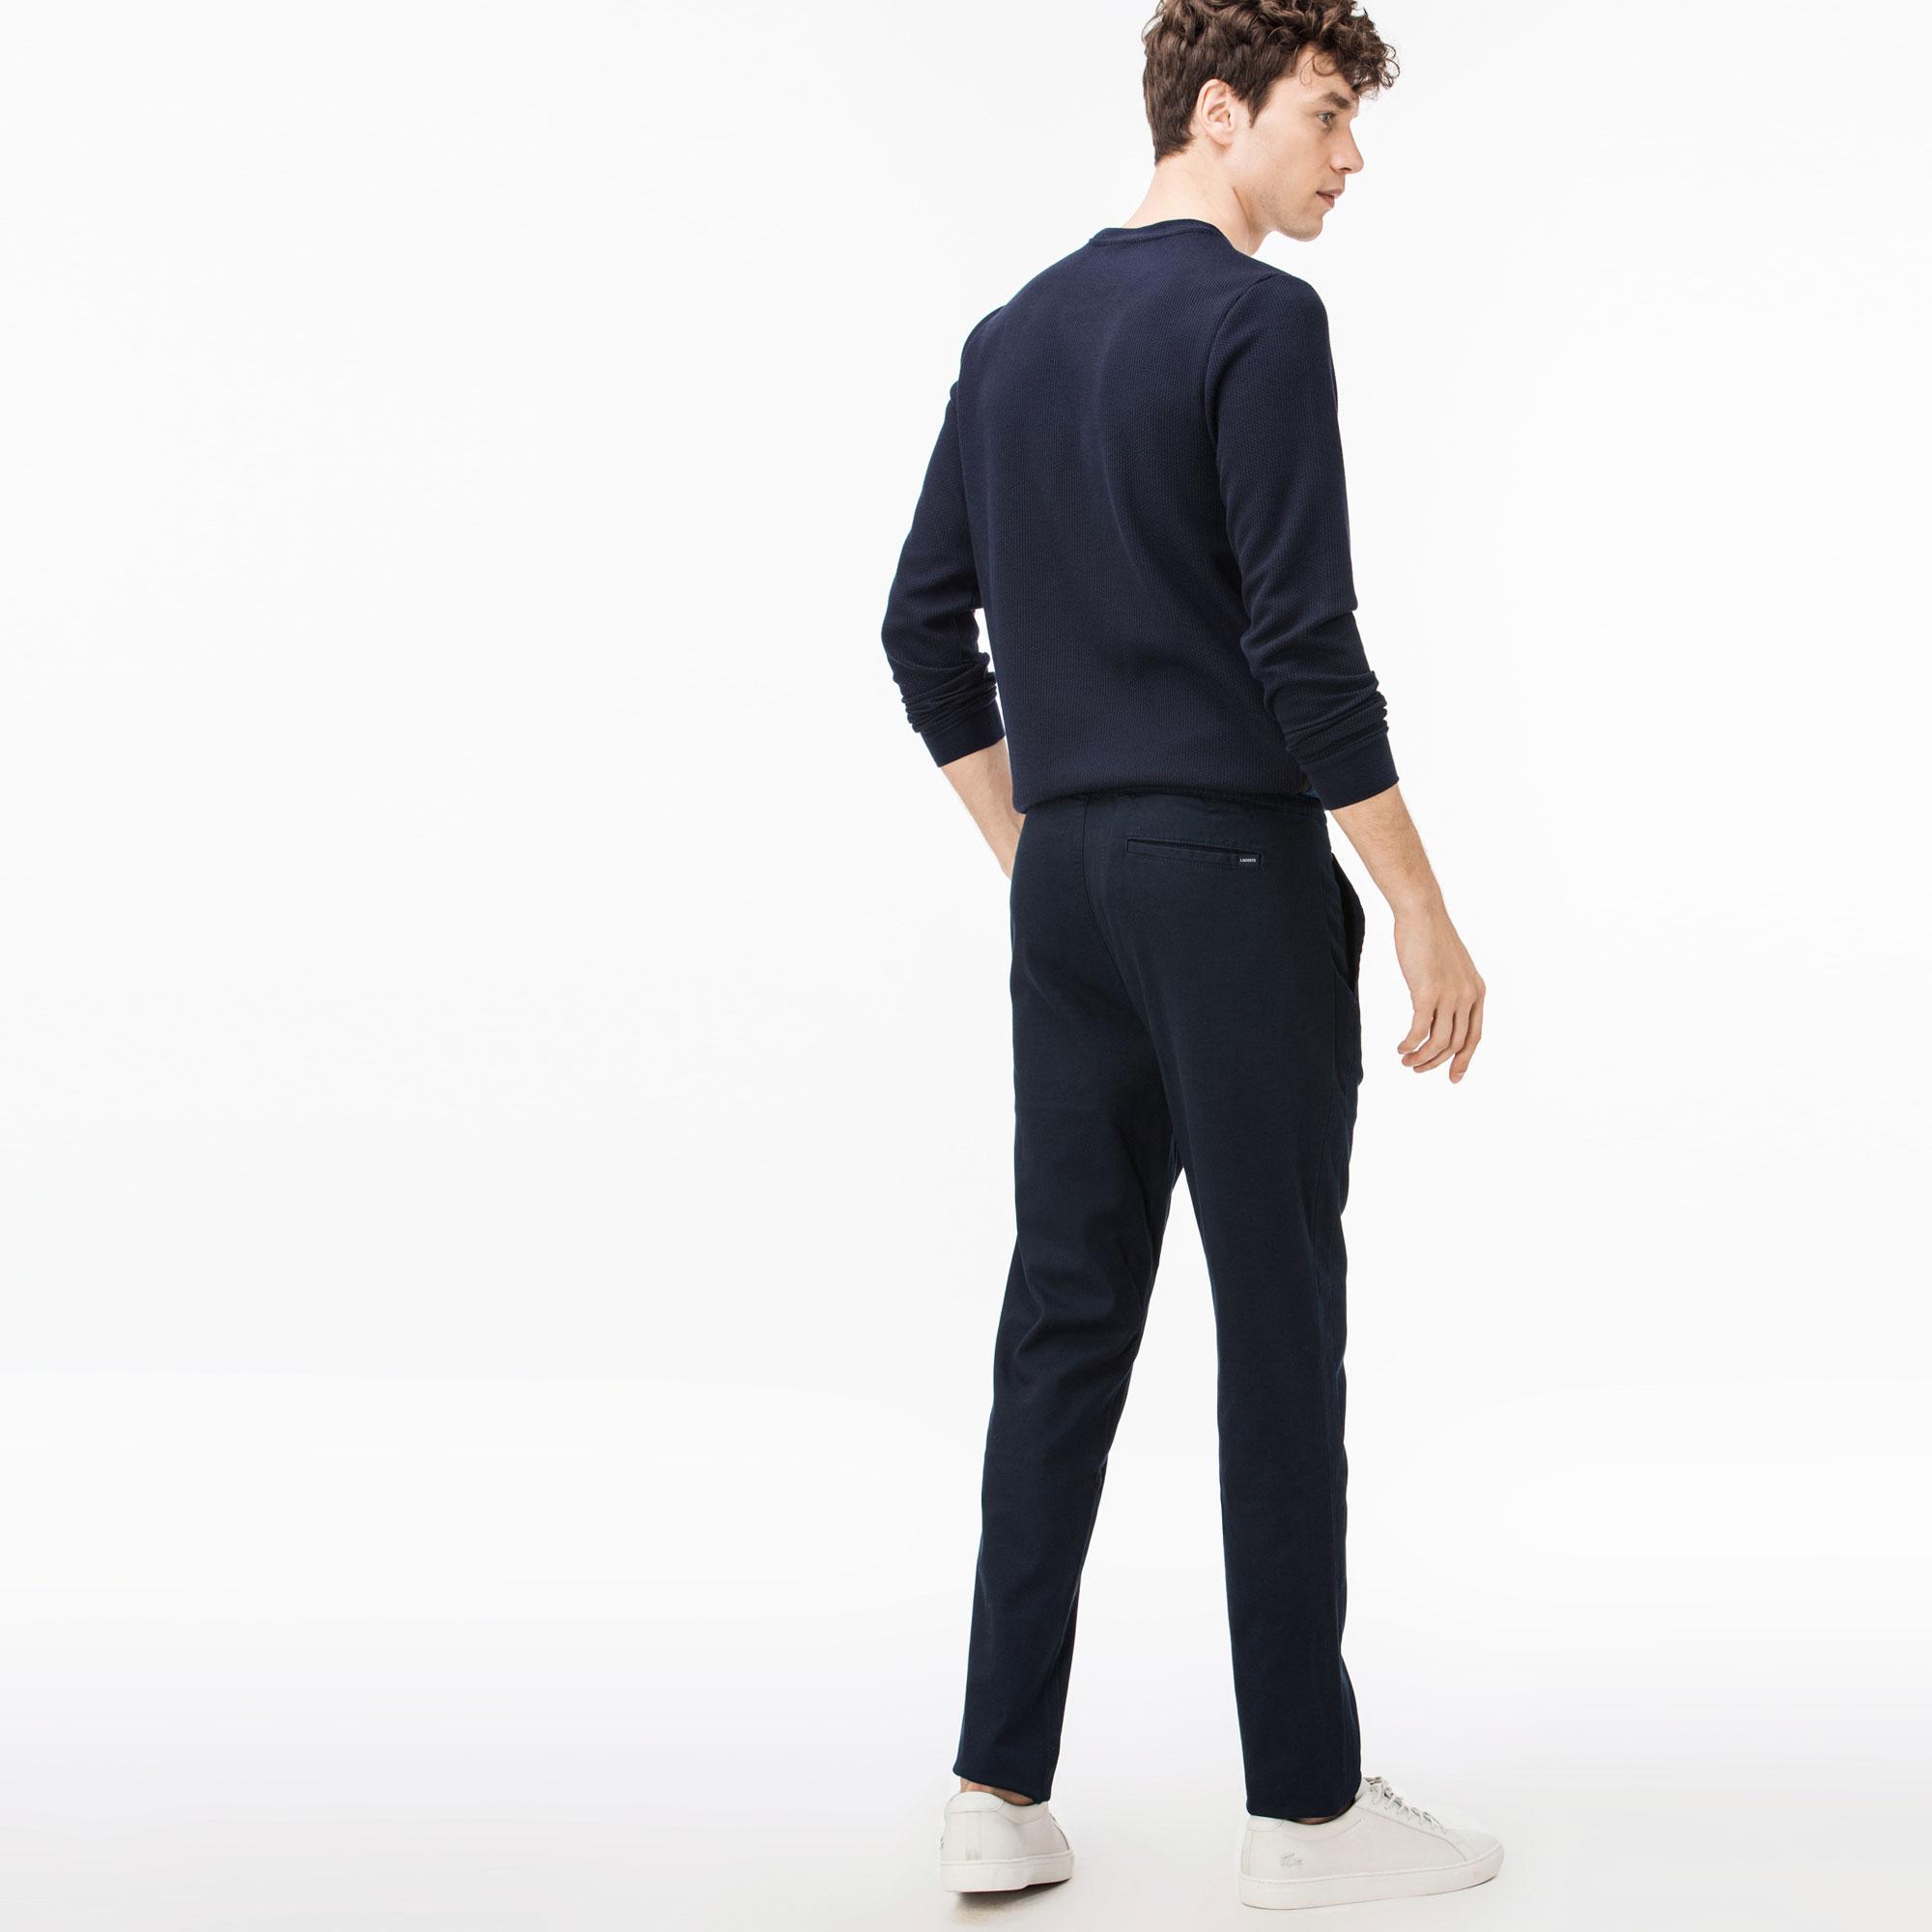 Lacoste Erkek Lacivert Gabardin Pantolon